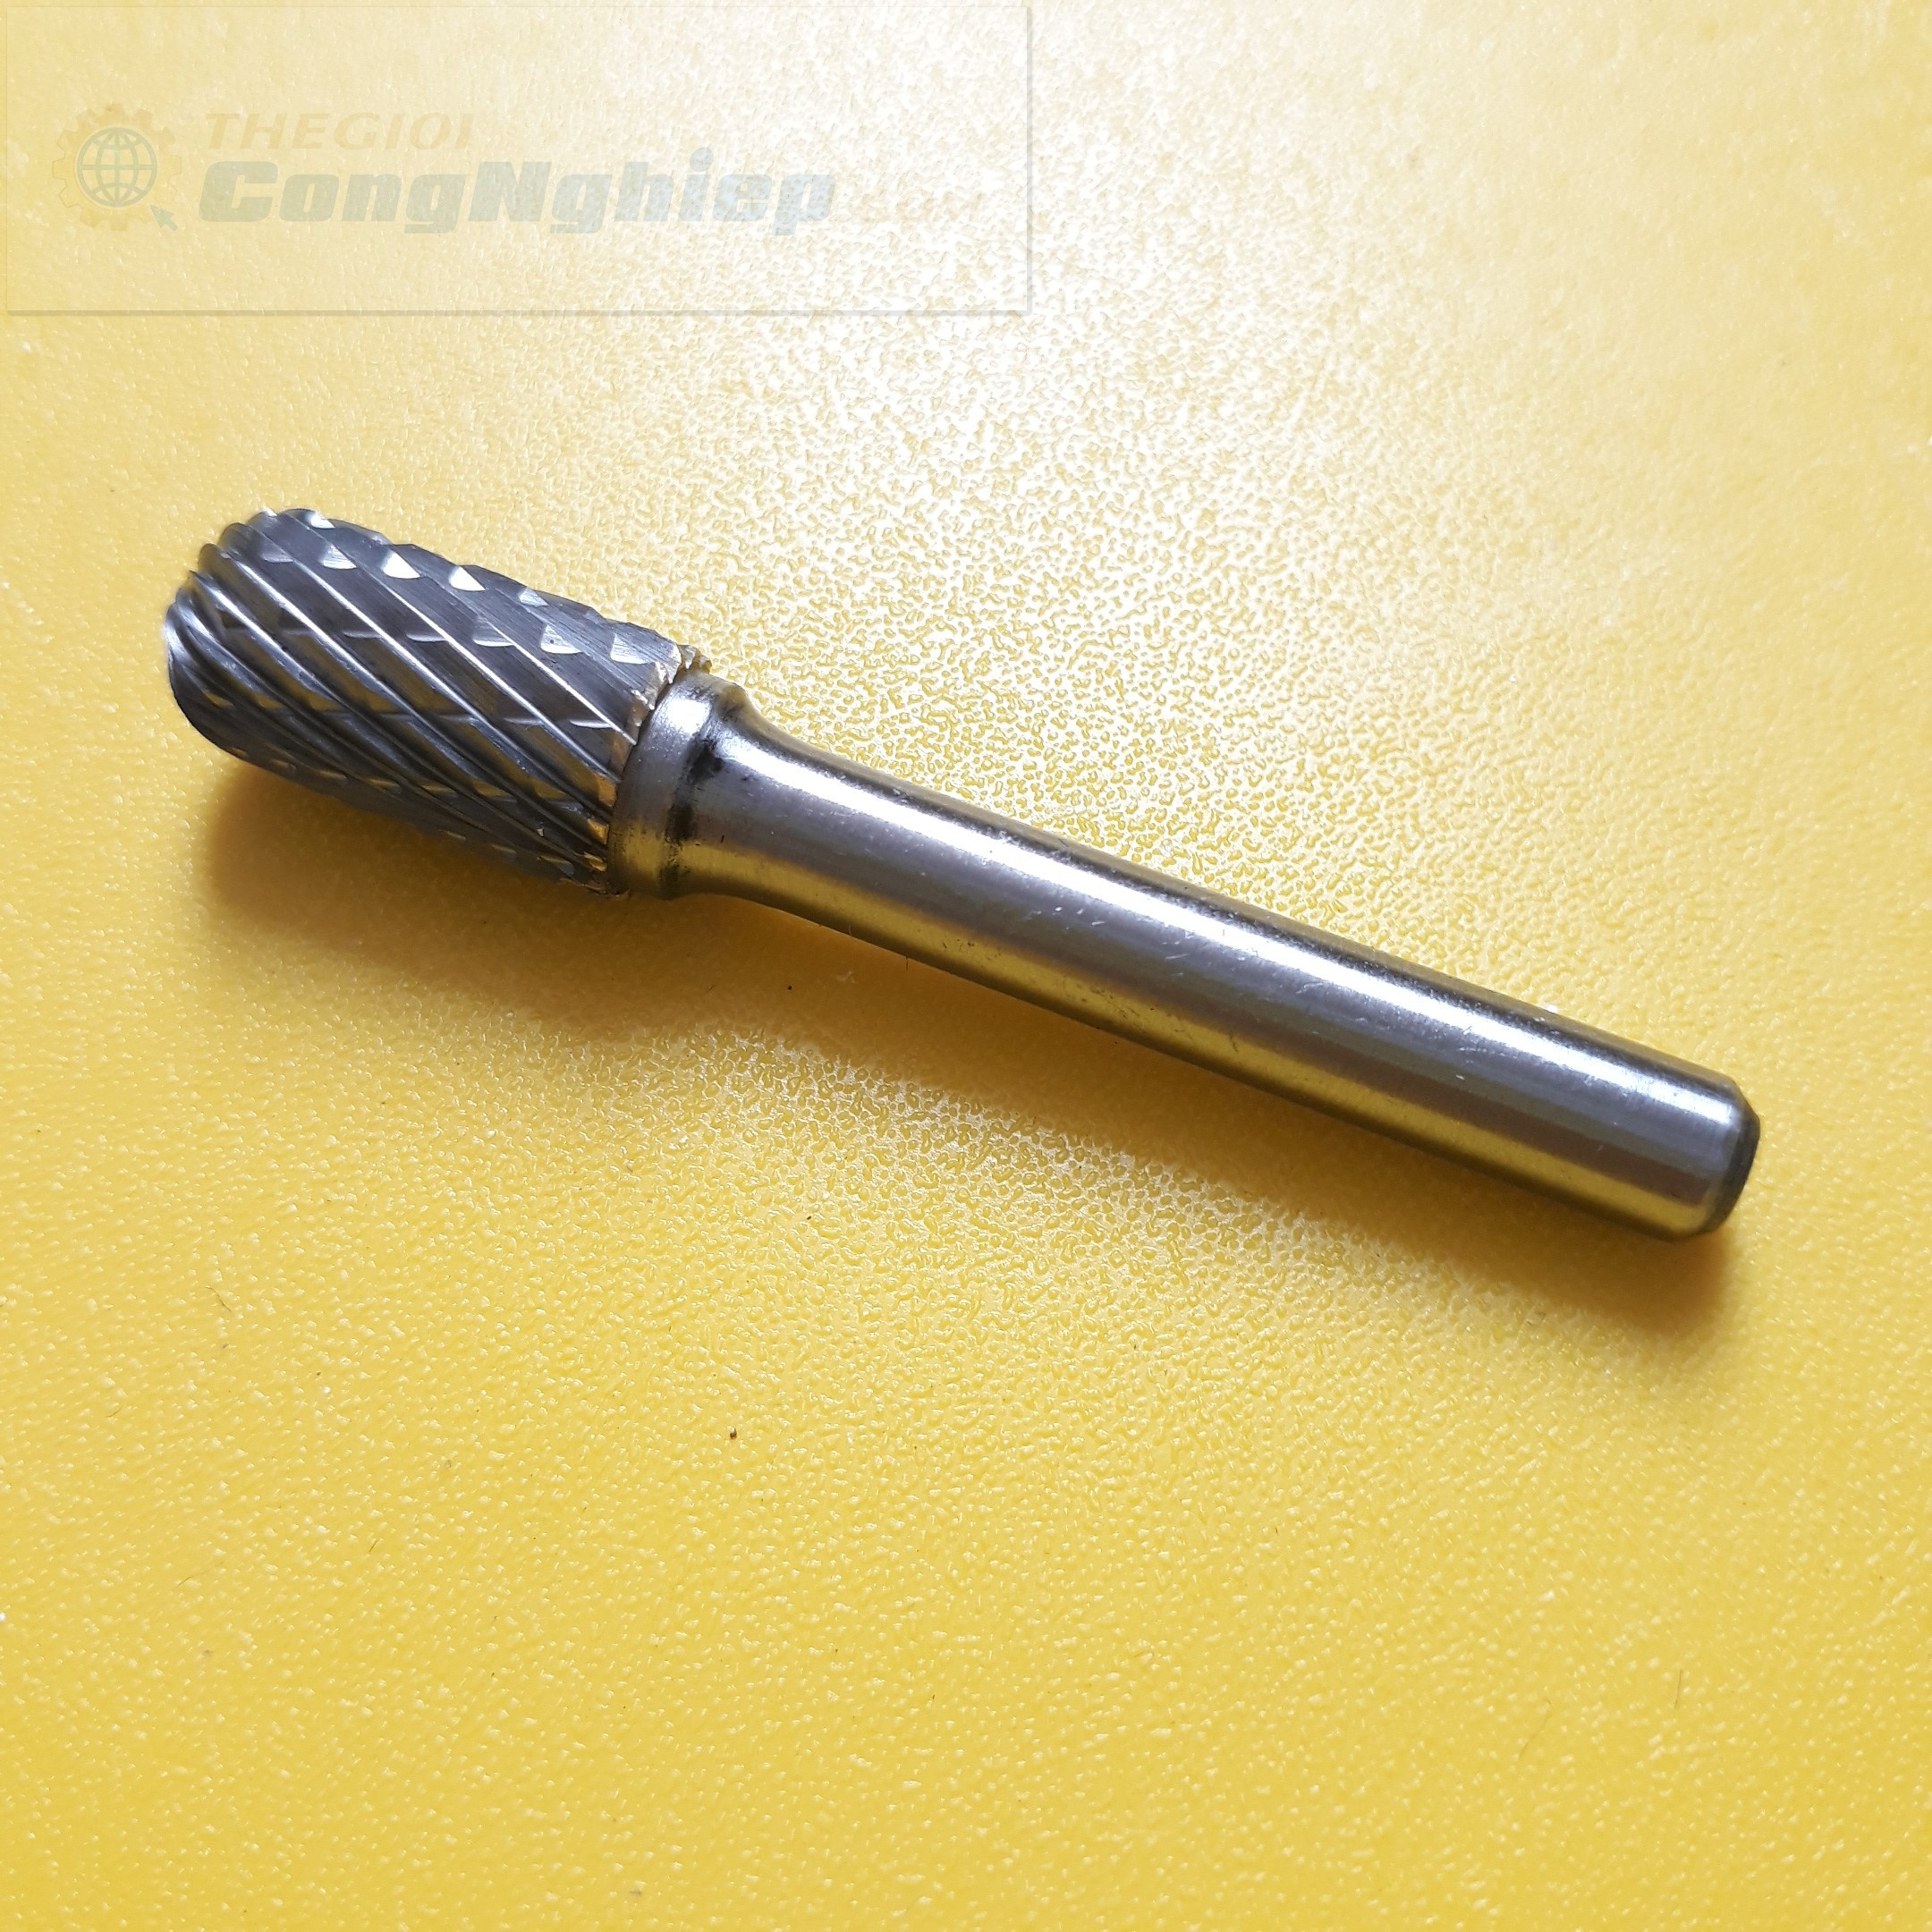 Bộ 5 mũi mài hợp kim 6x10mm  TGCN-49748 OEM-2499